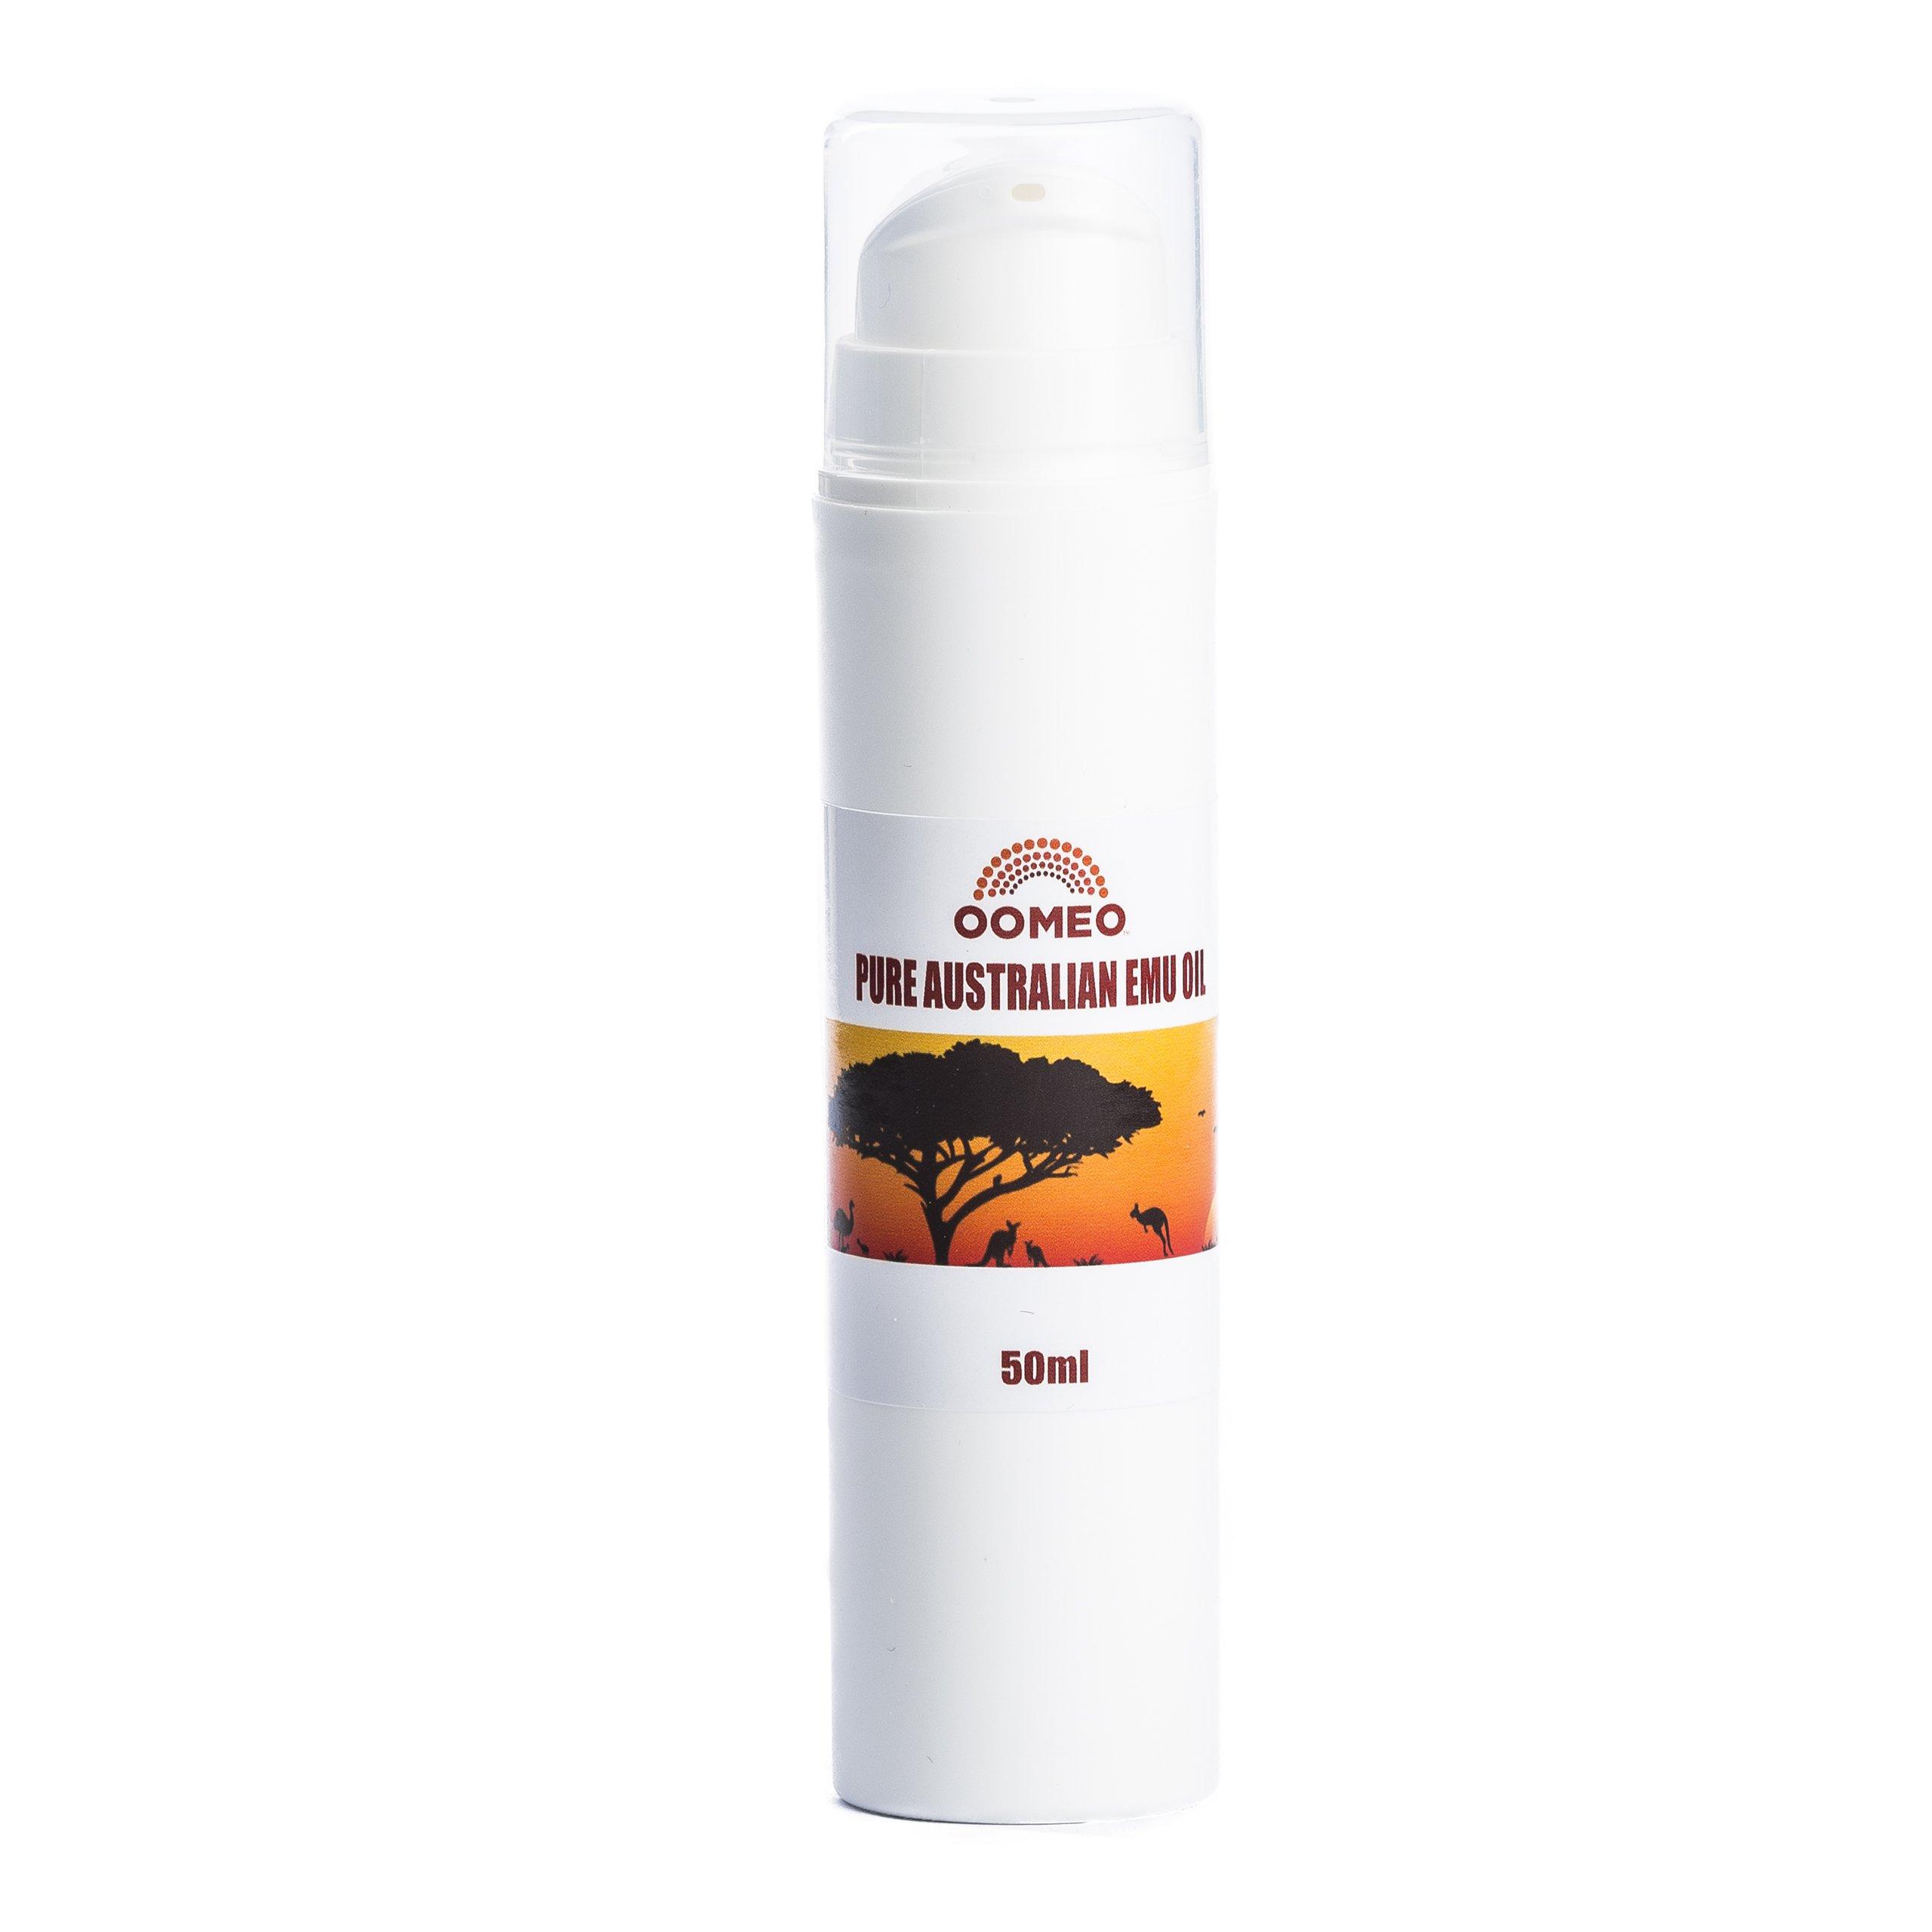 Pure Australian emu oil